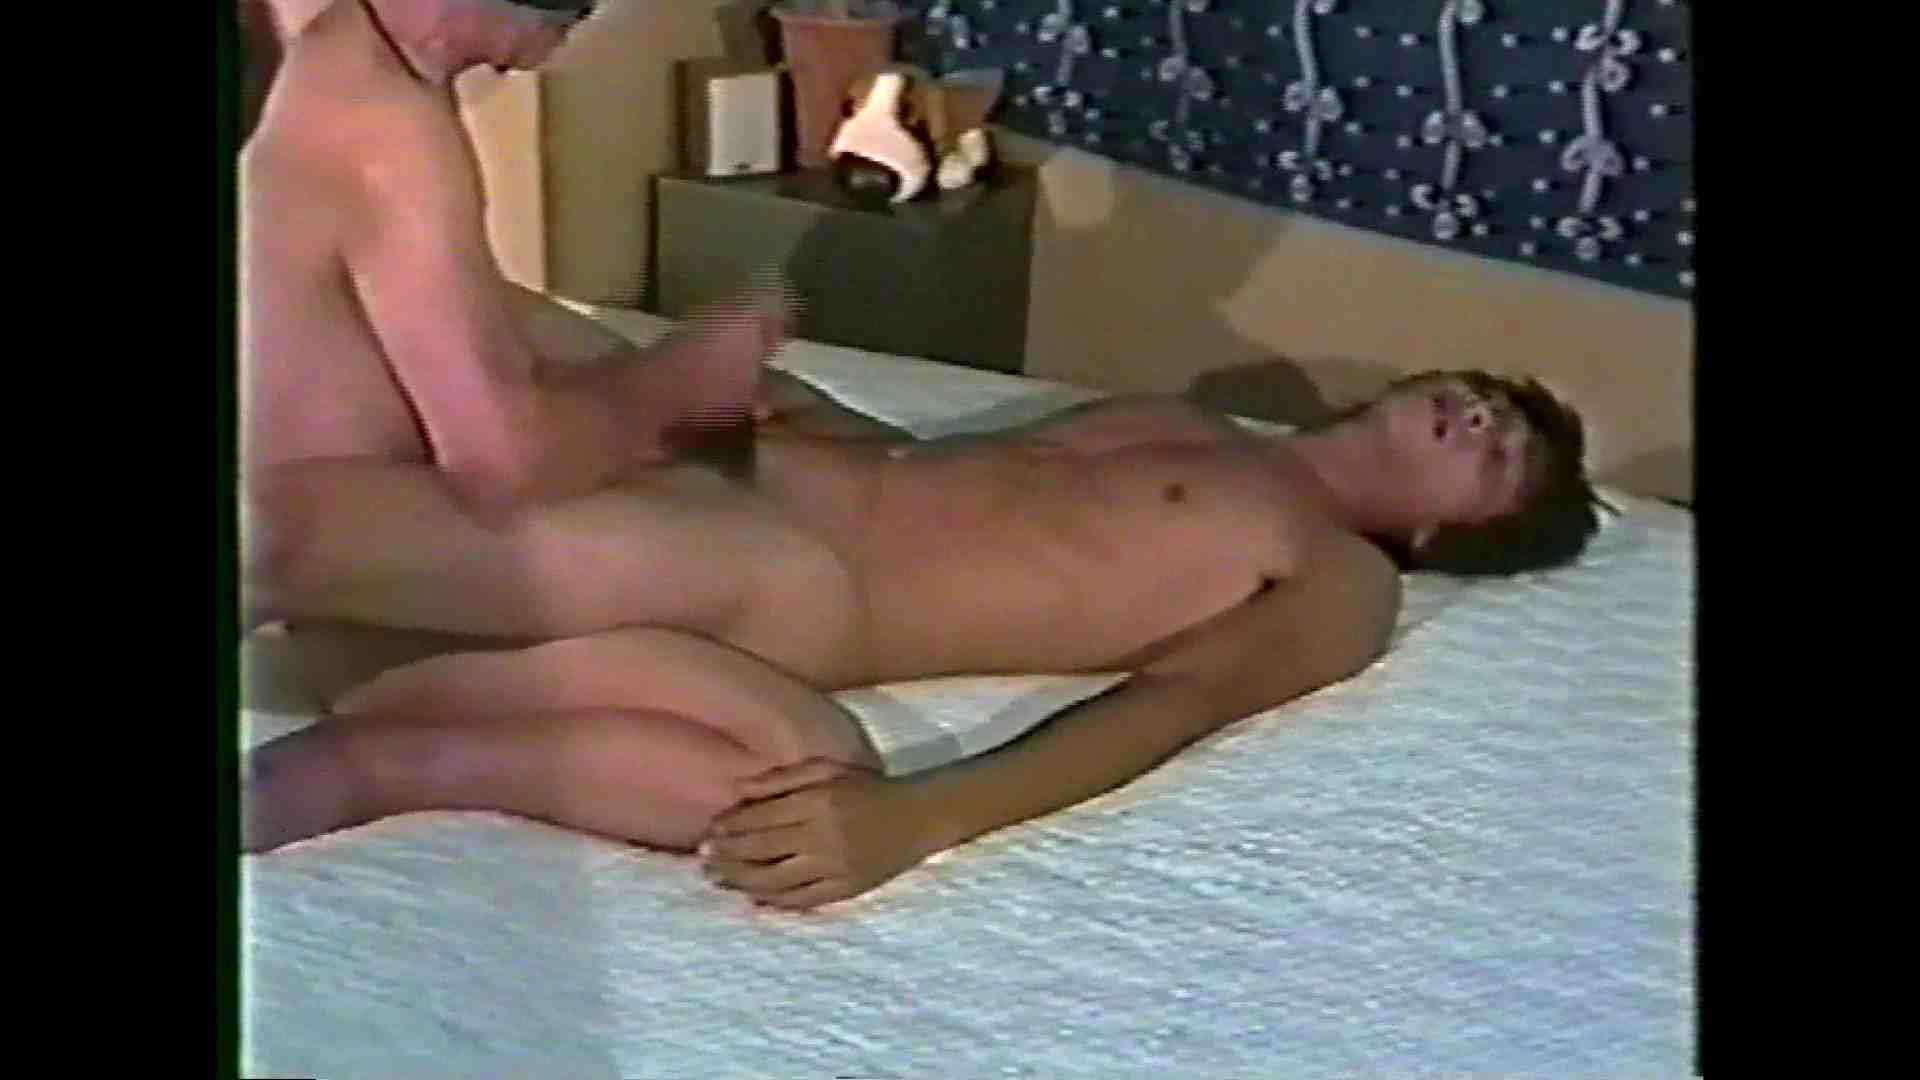 GAYBOY宏のオカズ倉庫Vol.3-4 オナニー アダルトビデオ画像キャプチャ 91pic 40